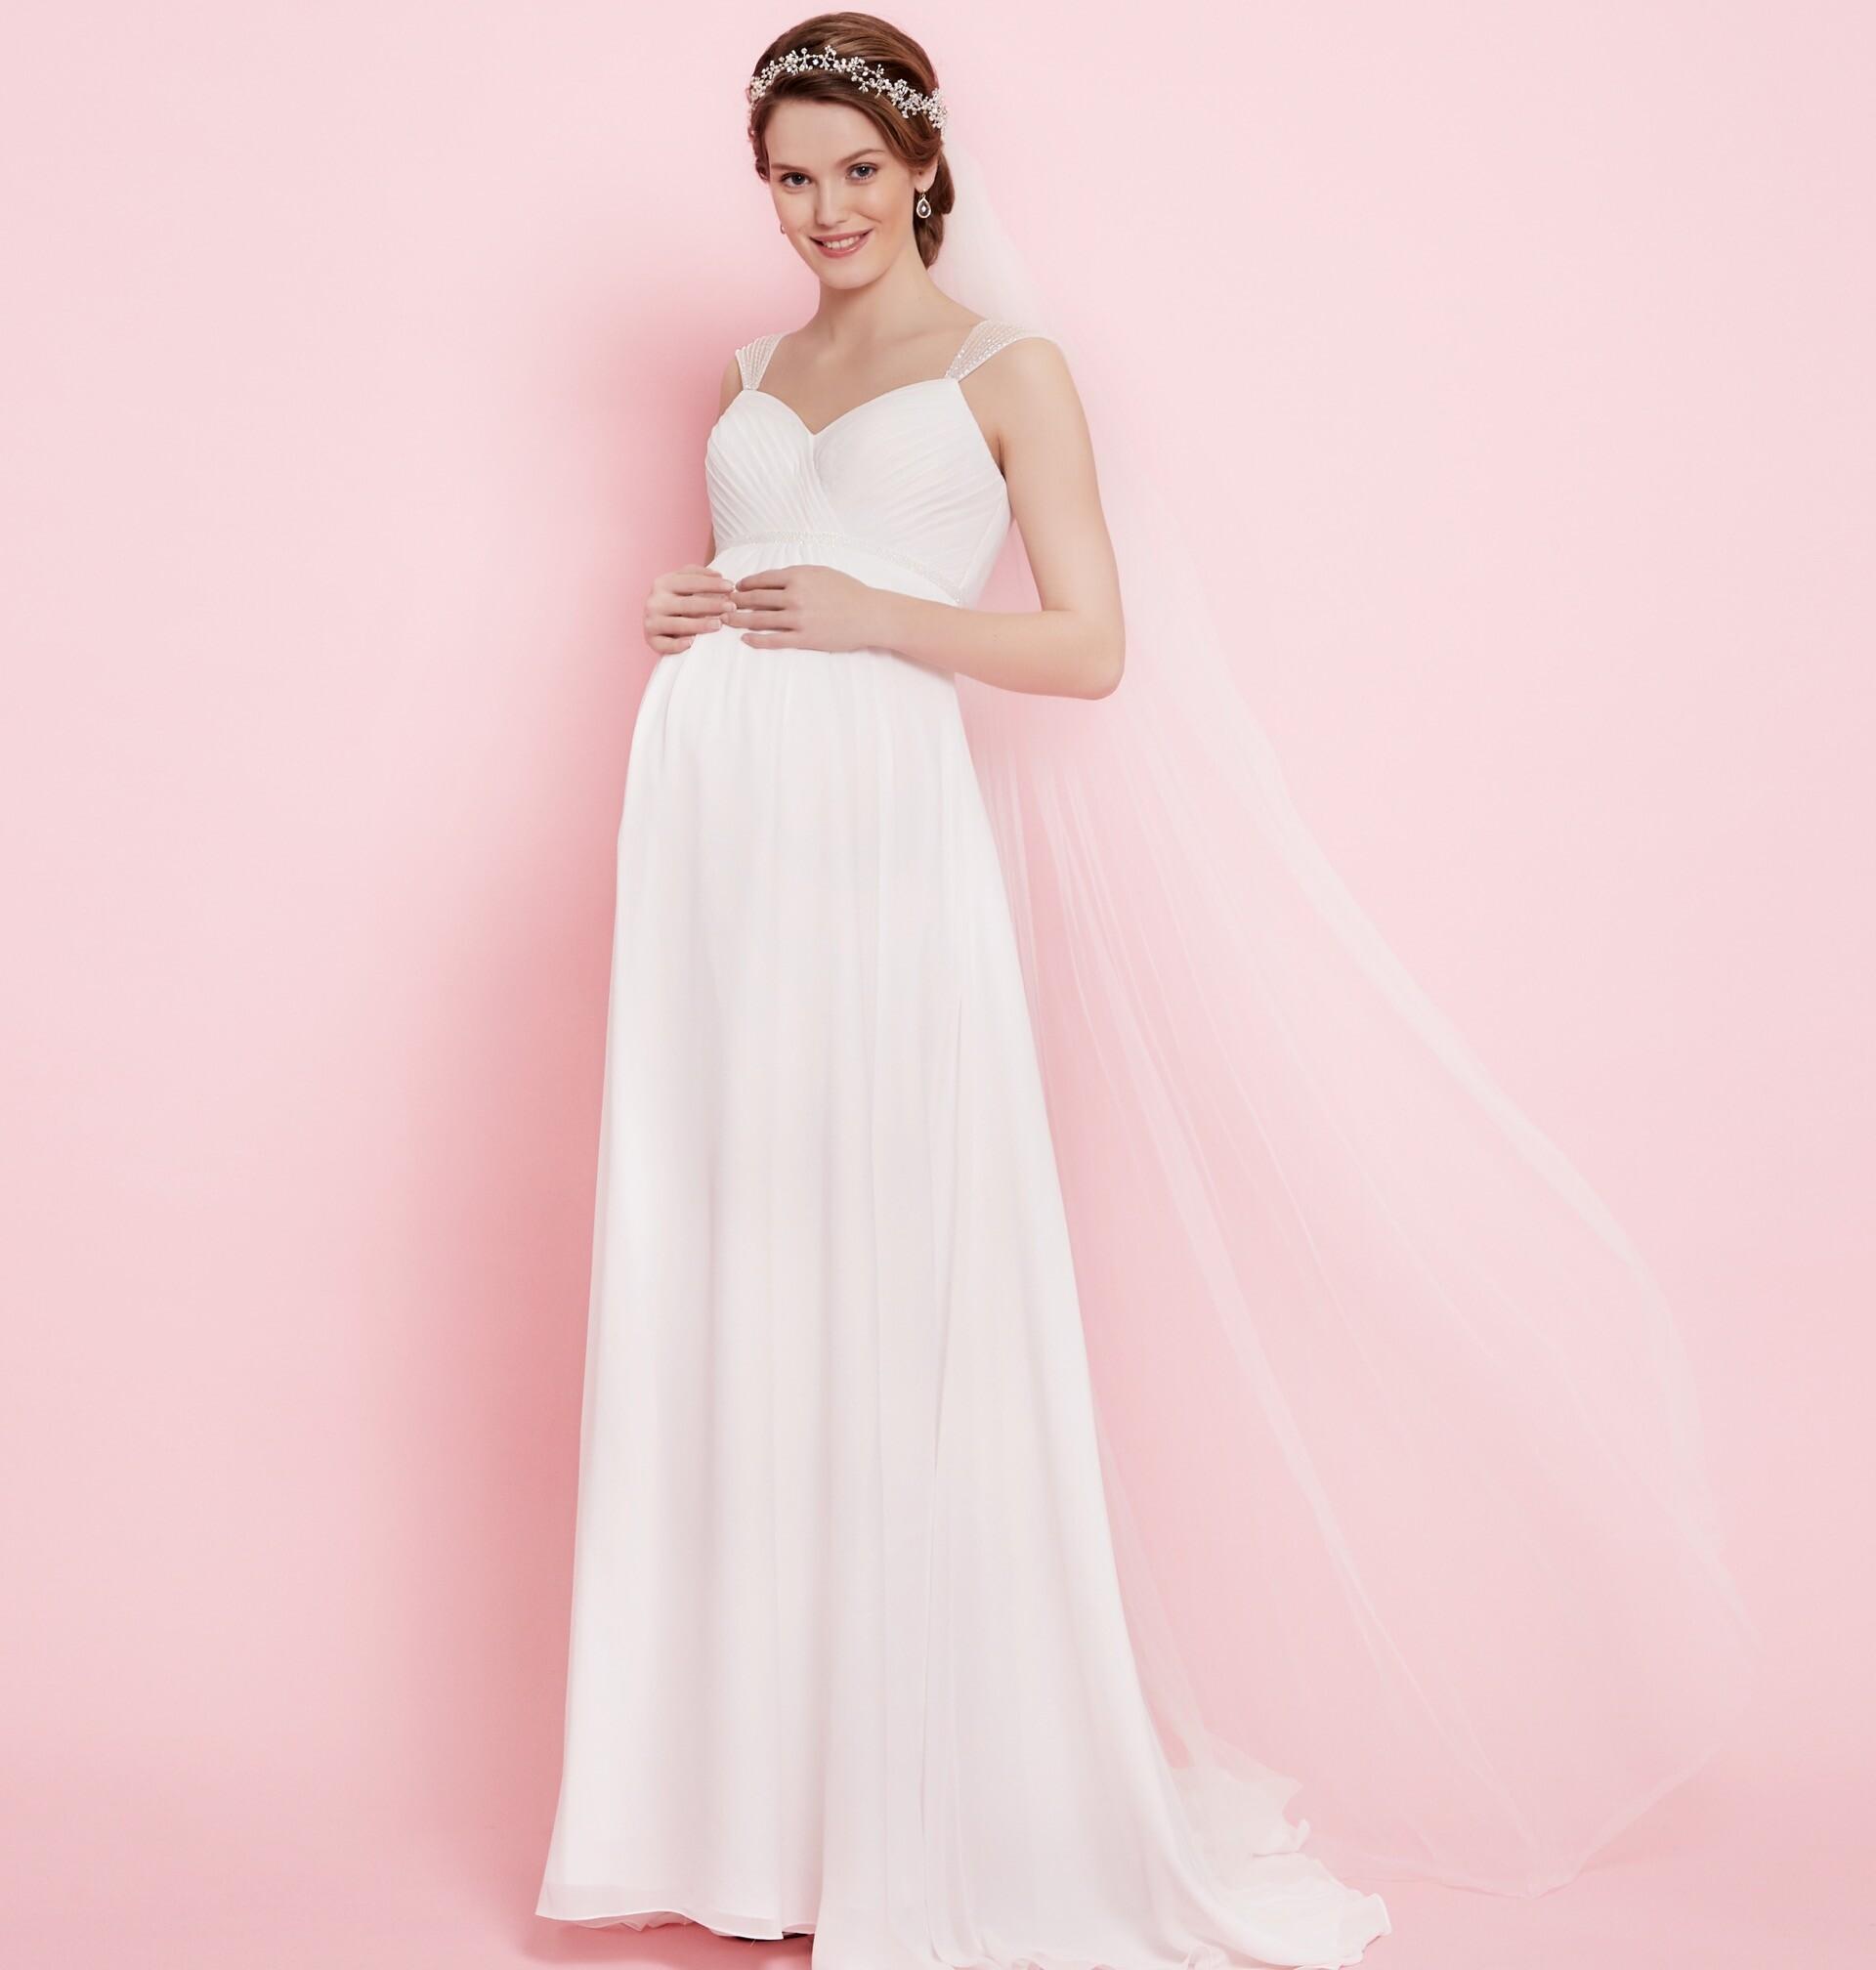 Brautkleid von Maternity by Lilly Style 08-2608